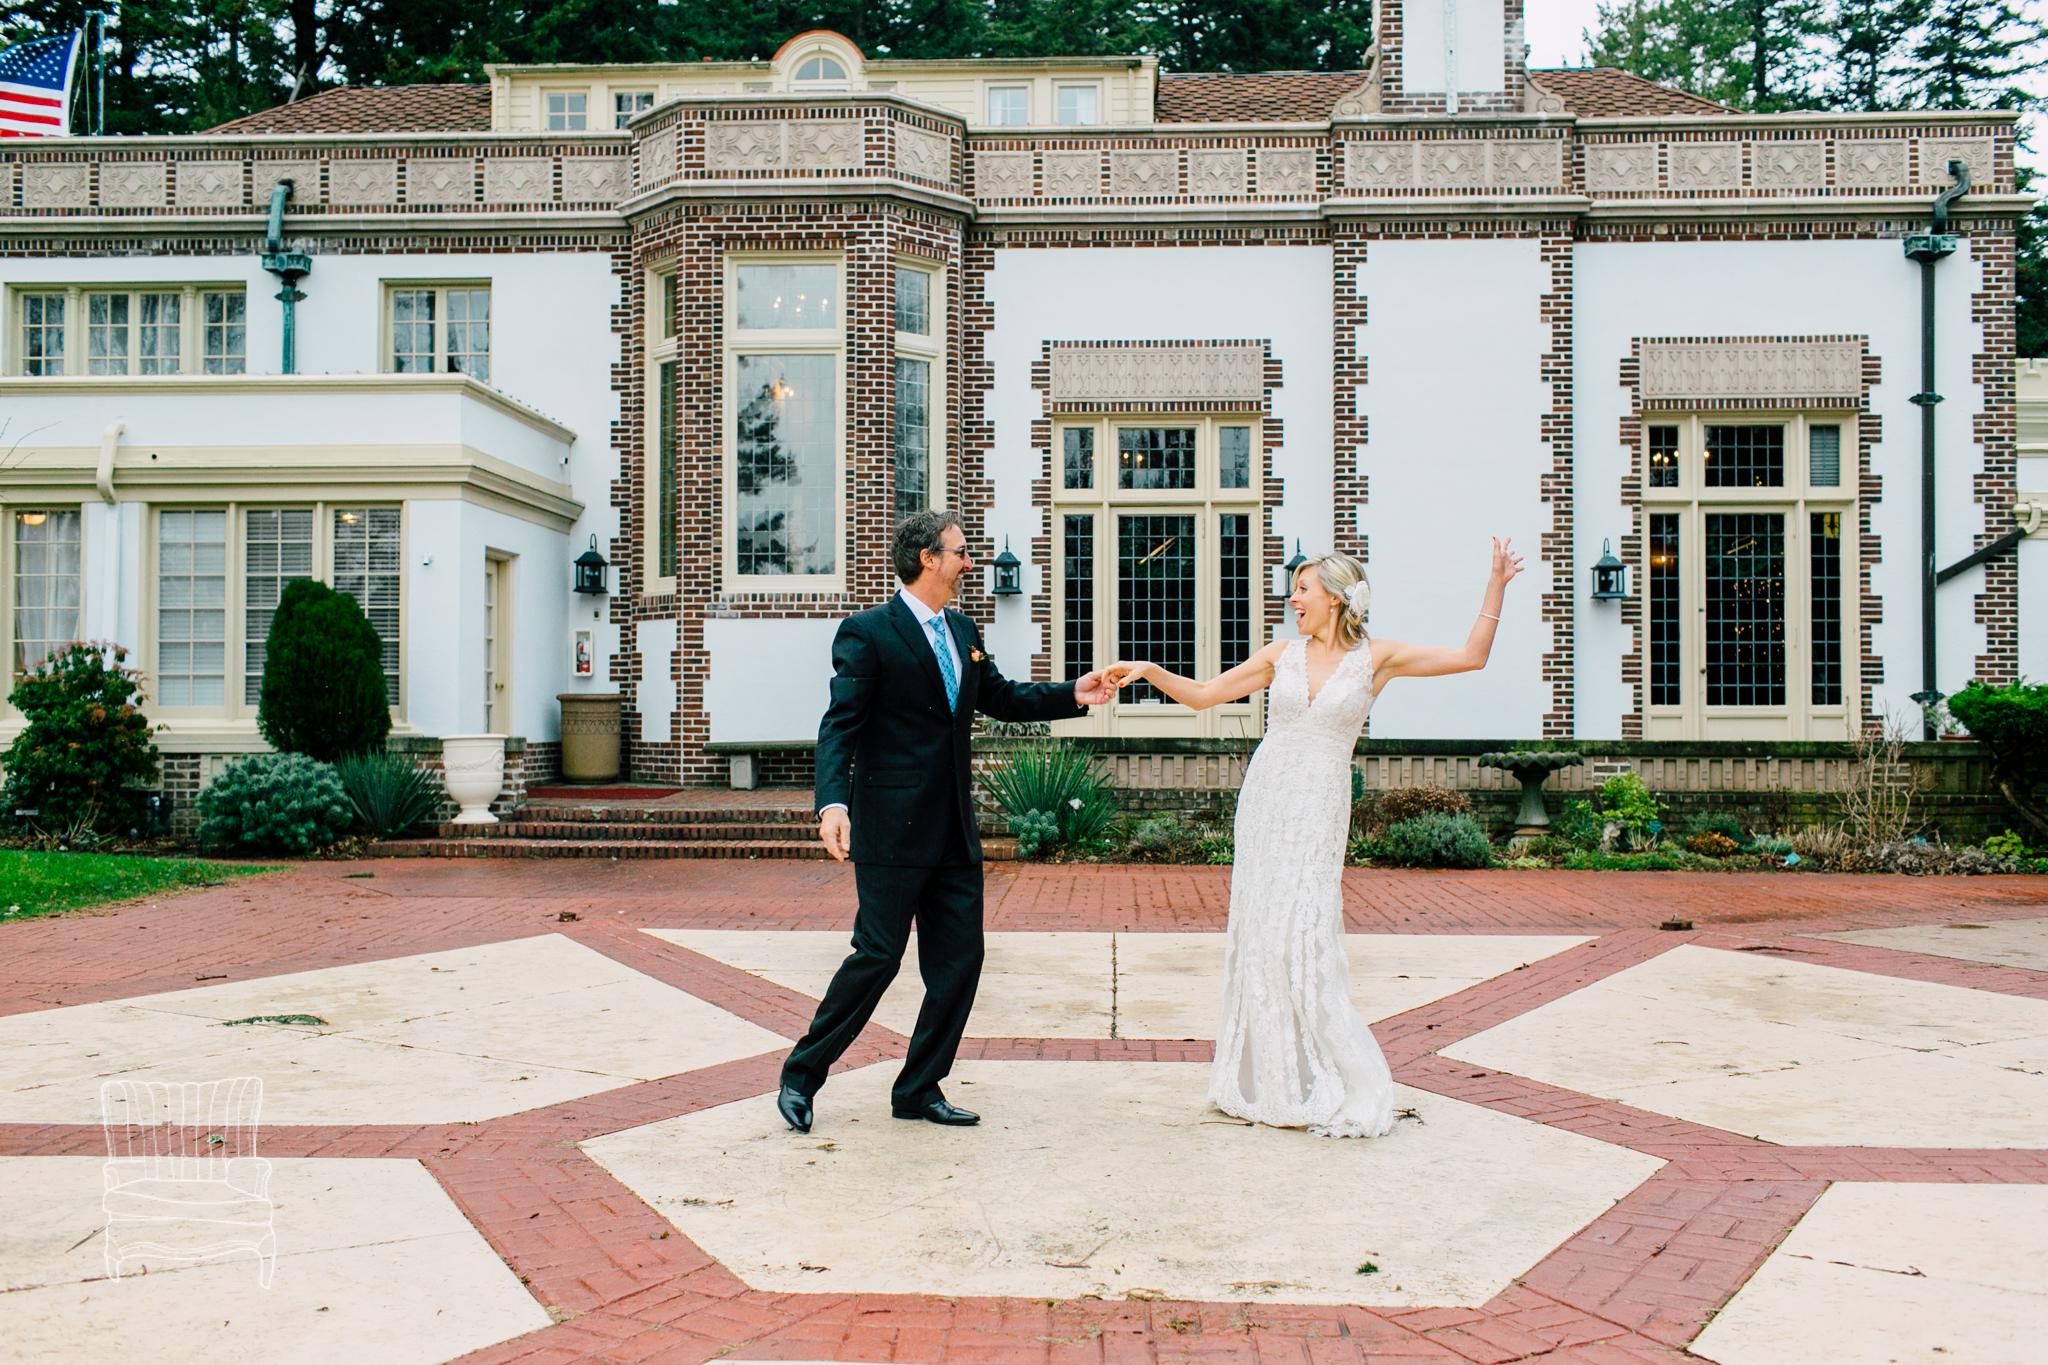 lairmont-manor-wedding-bellingham-new-years-eve-katheryn-moran-photography-8.jpg